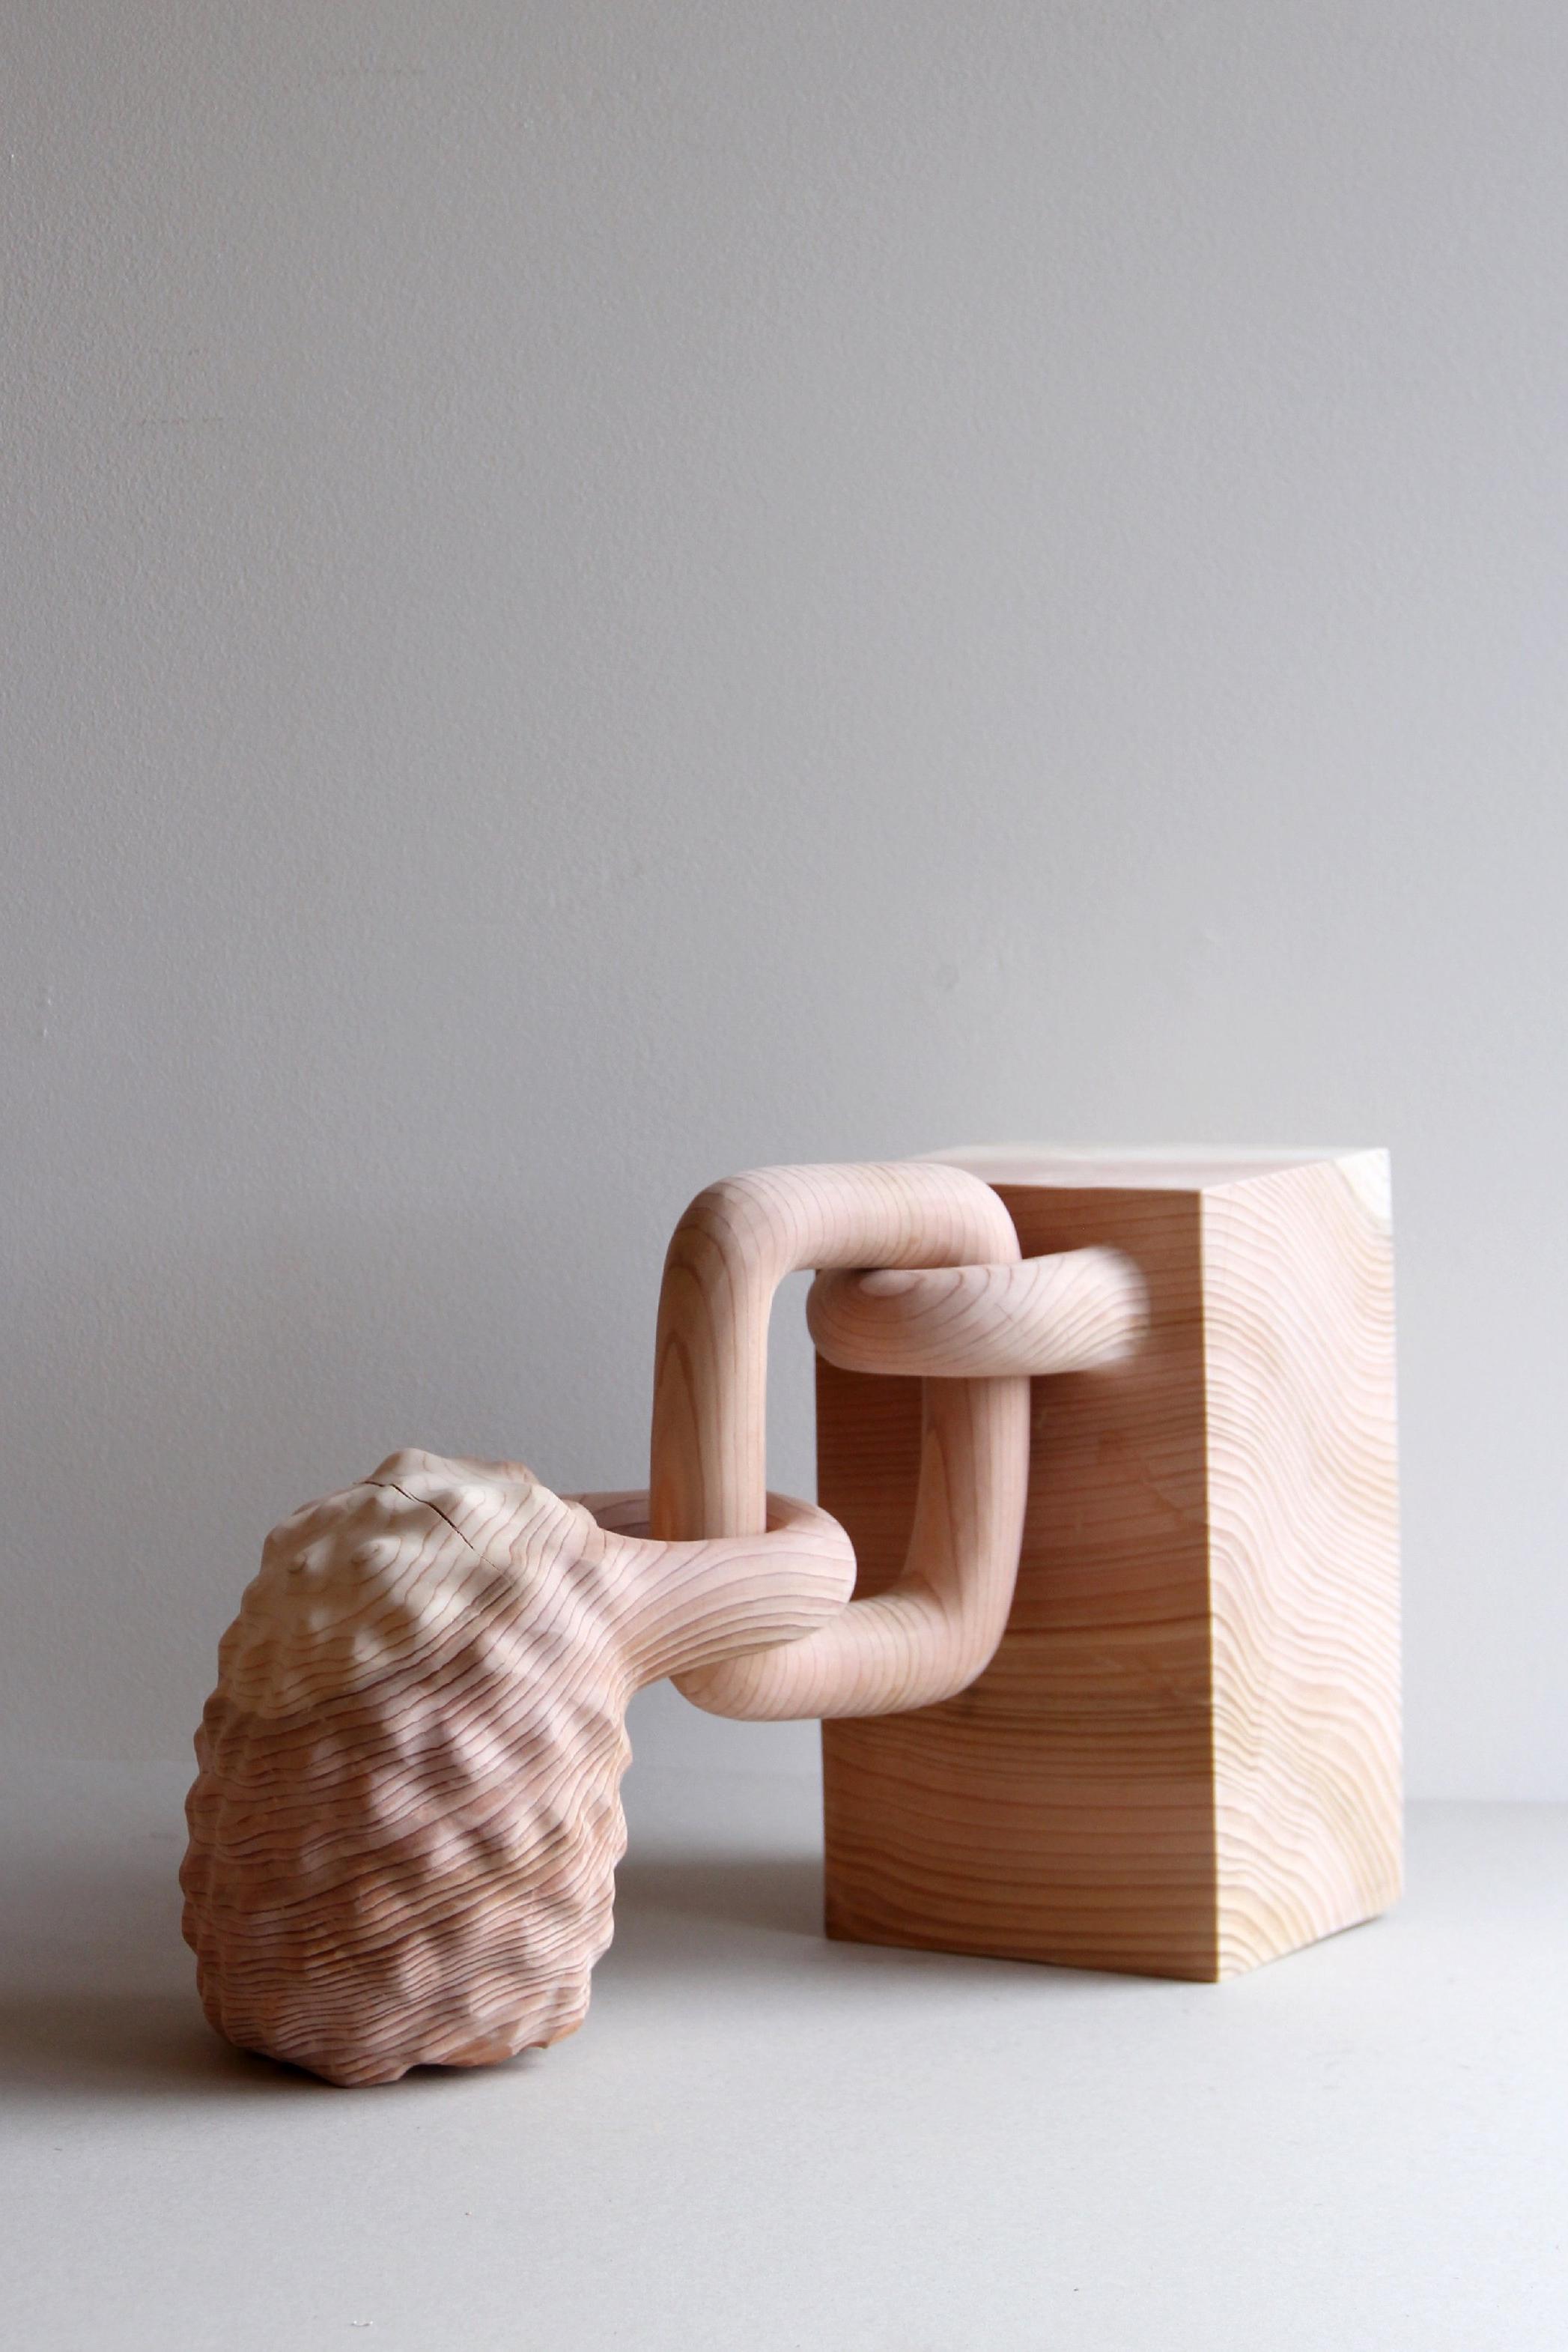 ariele_alasko_sculpture_16.jpg